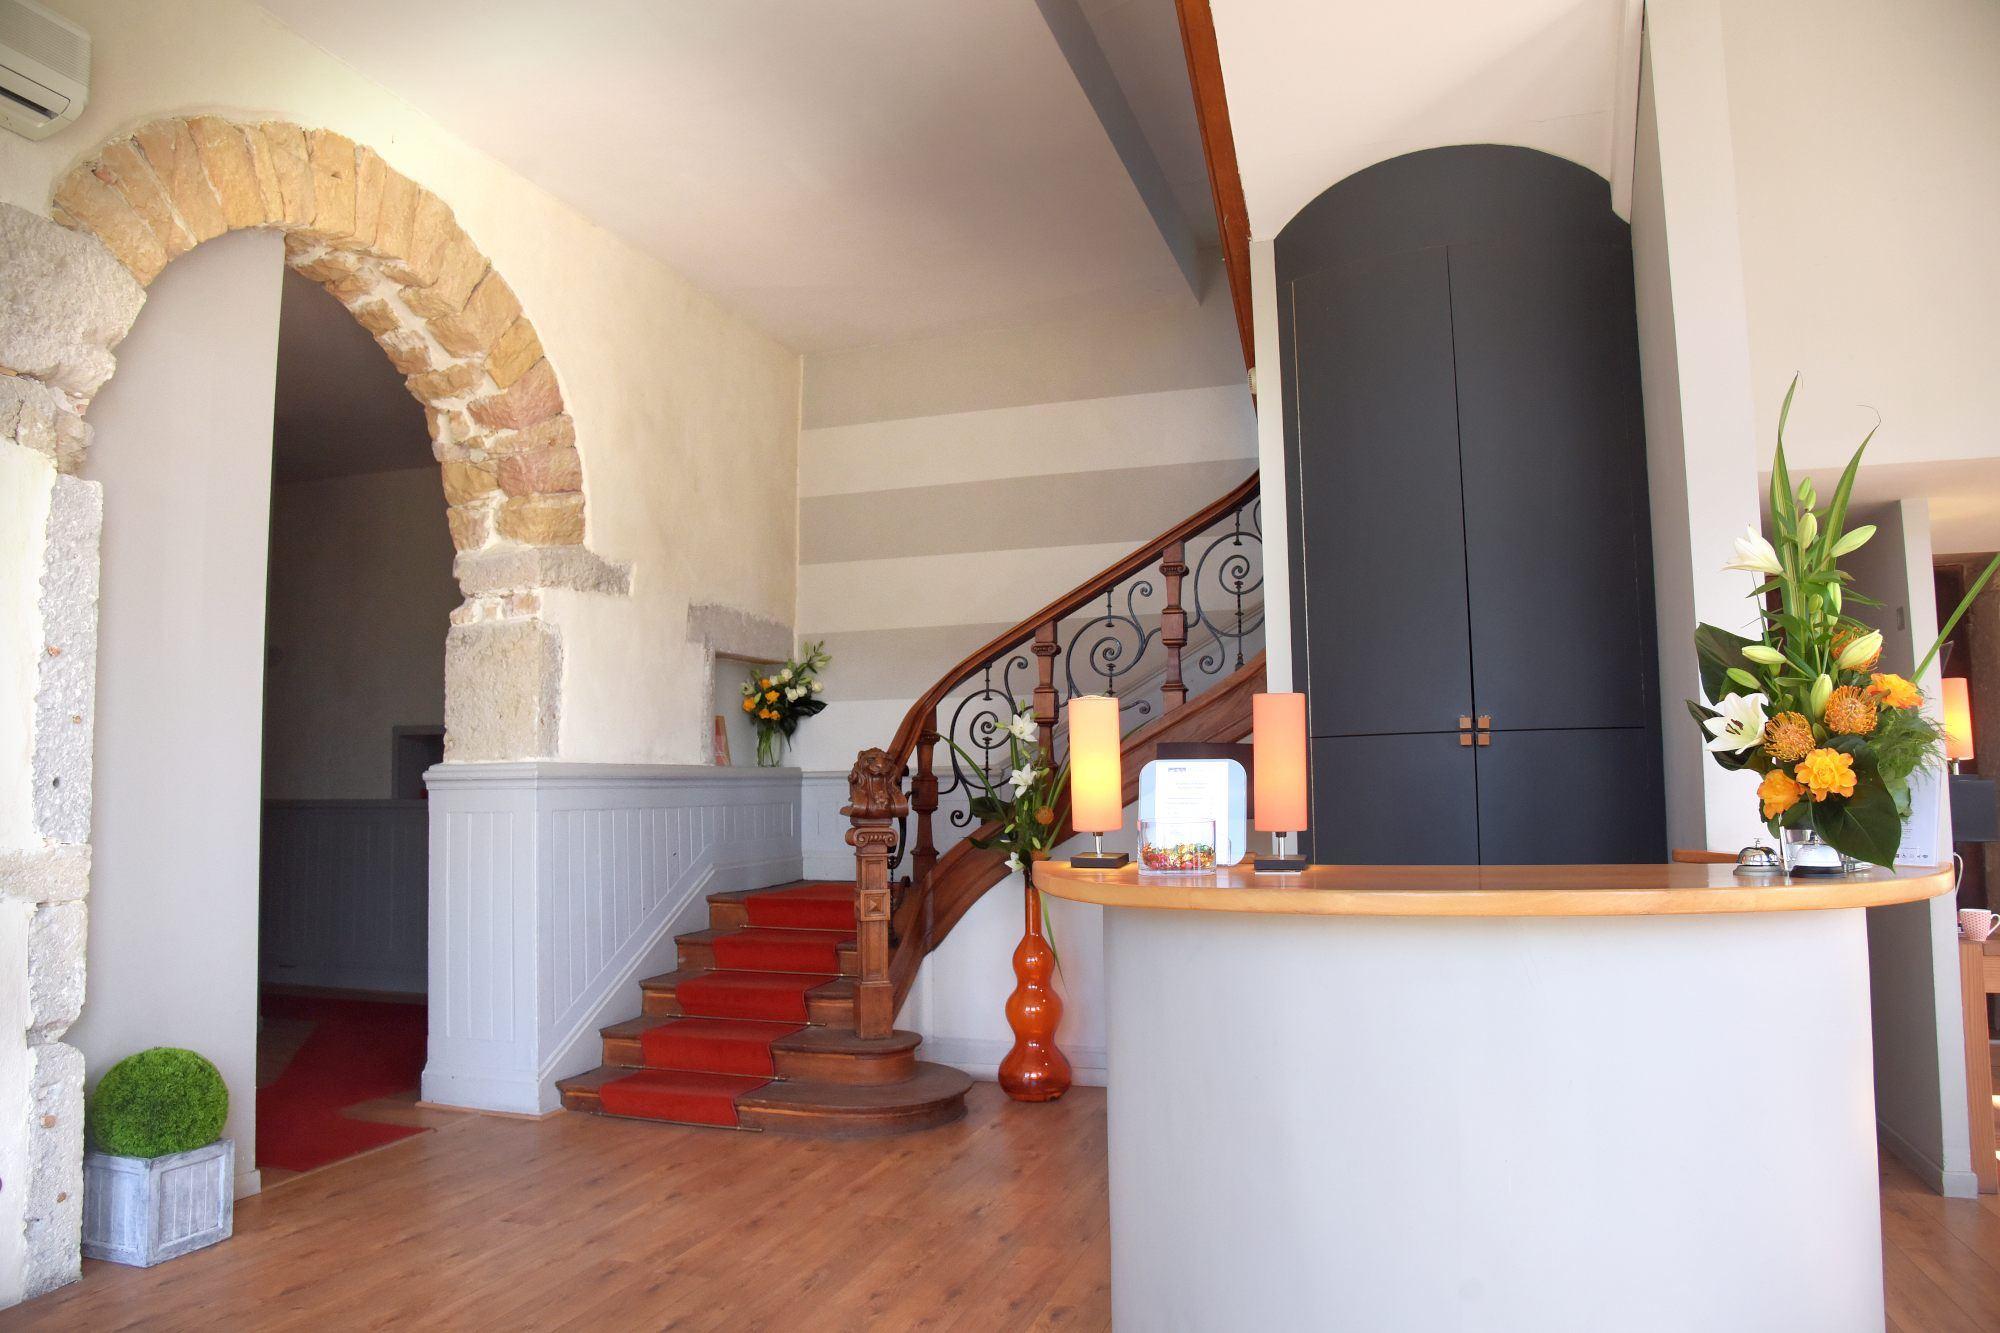 Hôtel Hôtelo